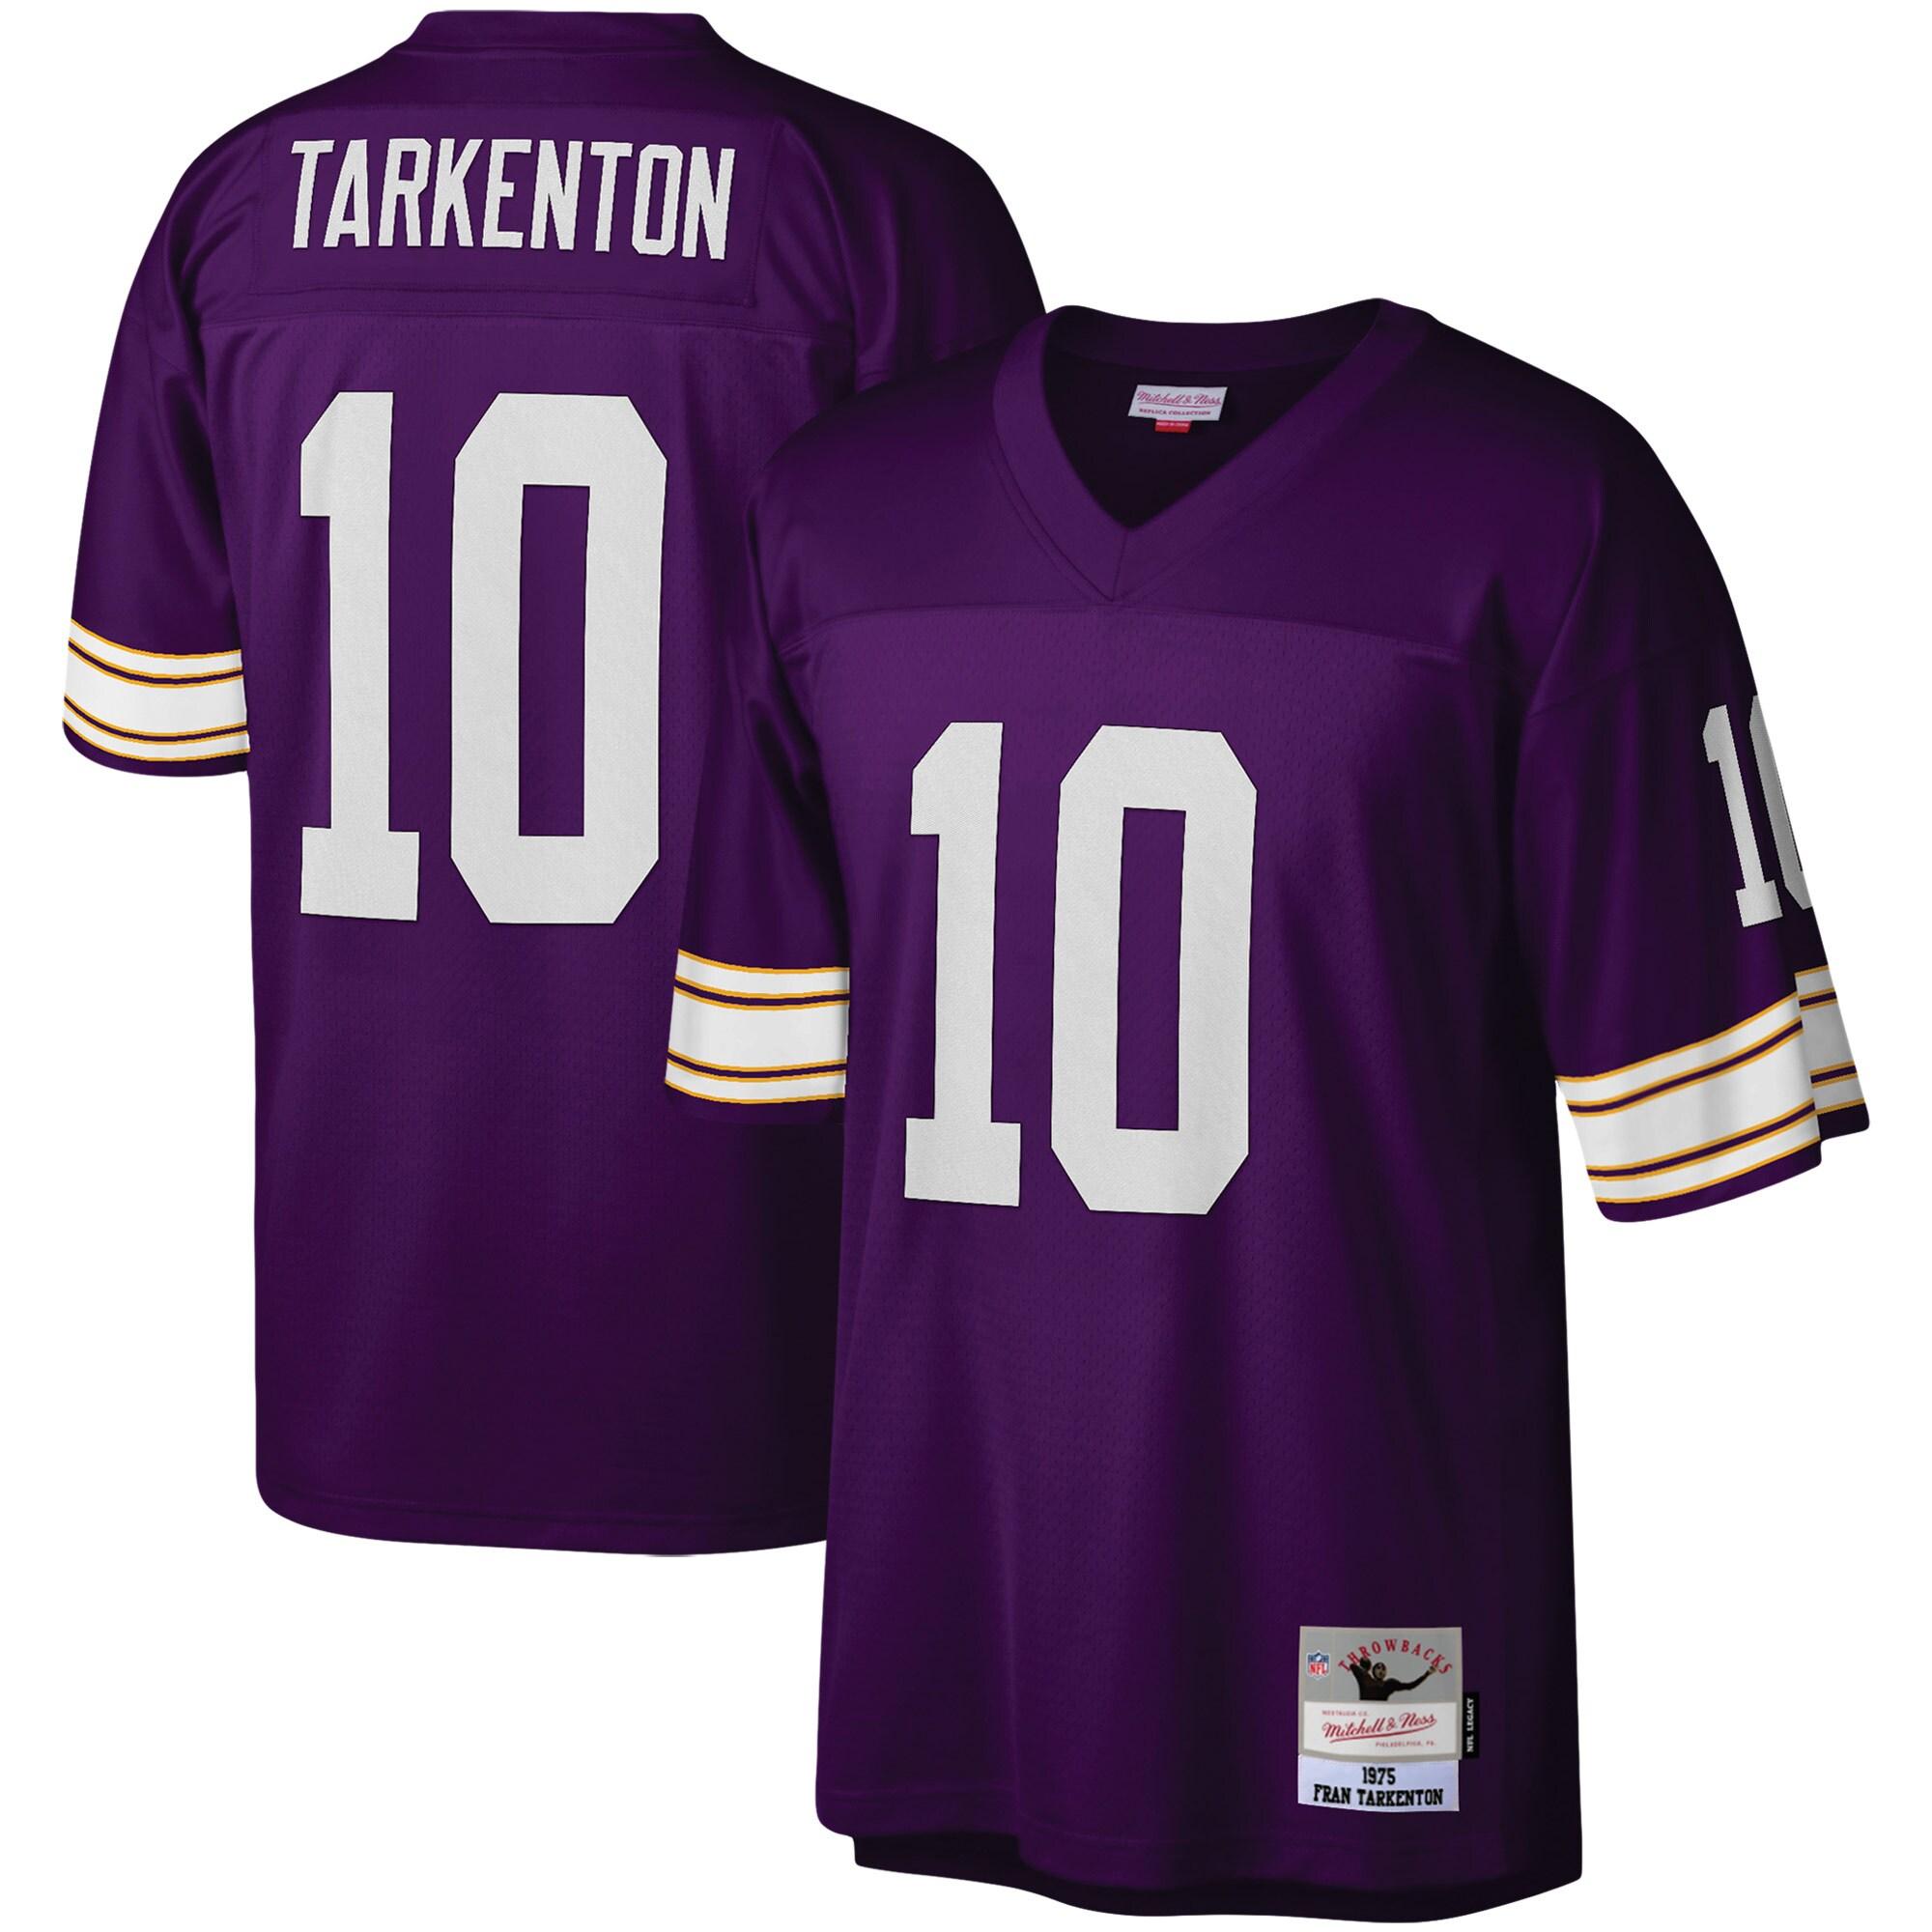 Fran Tarkenton Minnesota Vikings Mitchell & Ness Legacy Replica Jersey - Purple - Walmart.com